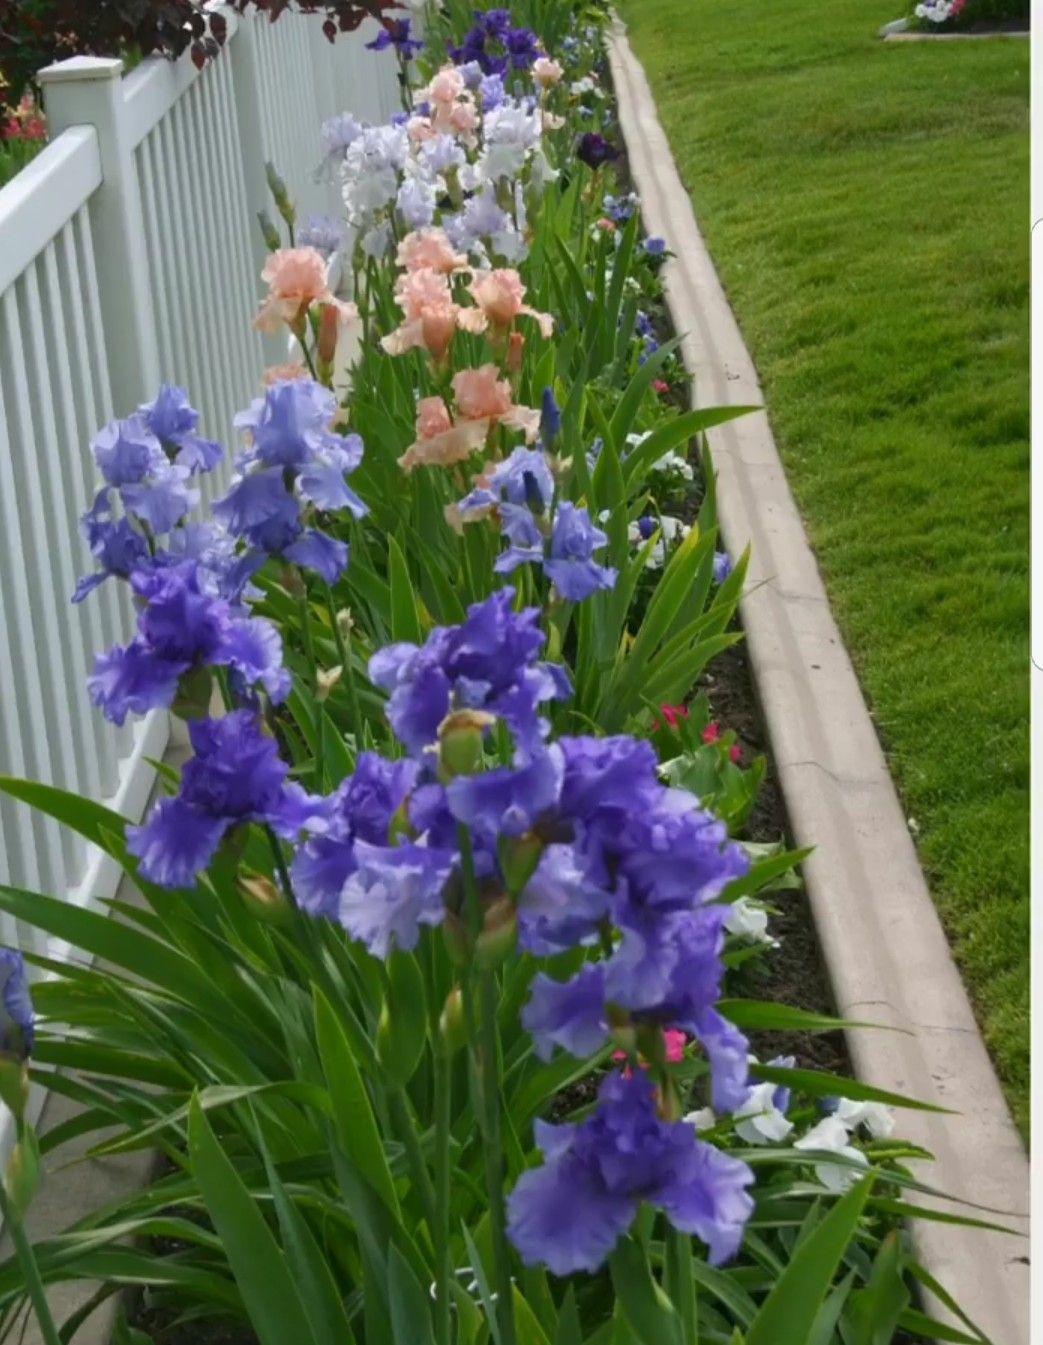 Pin By Sherry Allnutt On Garden Ideas Iris Garden Flower Landscape Iris Flowers